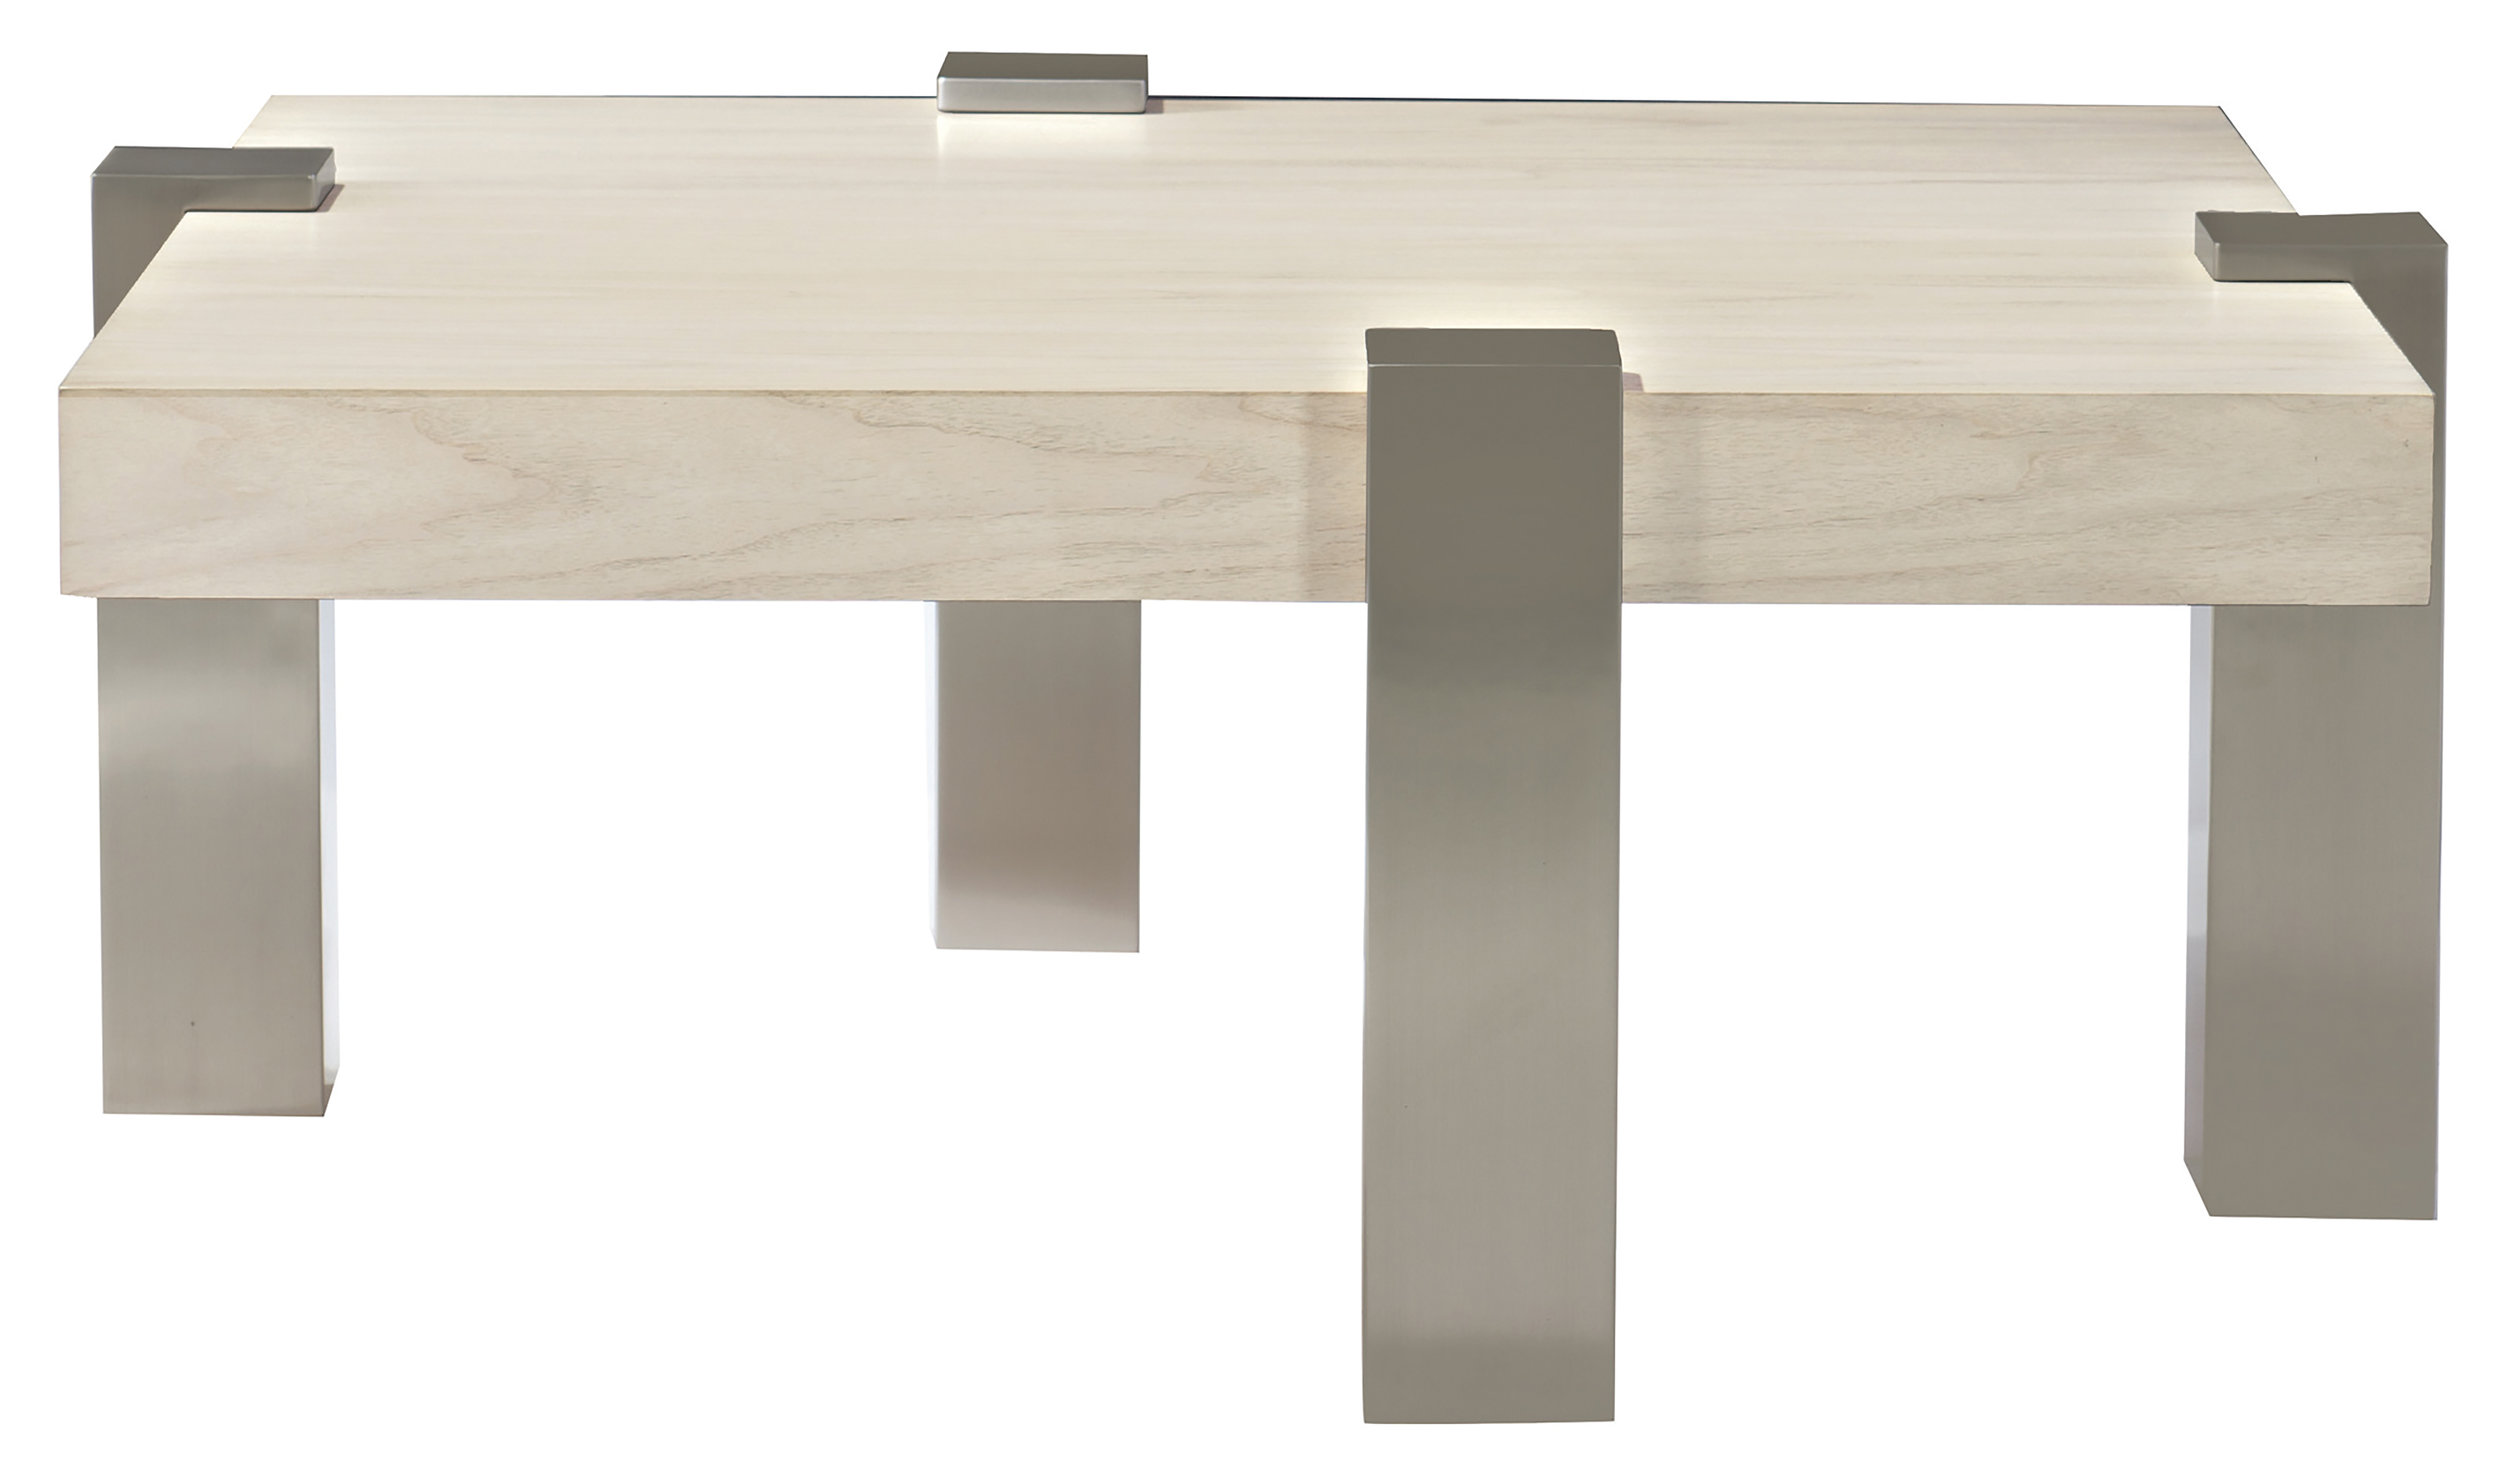 3. 2017_Bernhardt_Interiors_Hutchins_Cocktail_Table_375-010.jpg